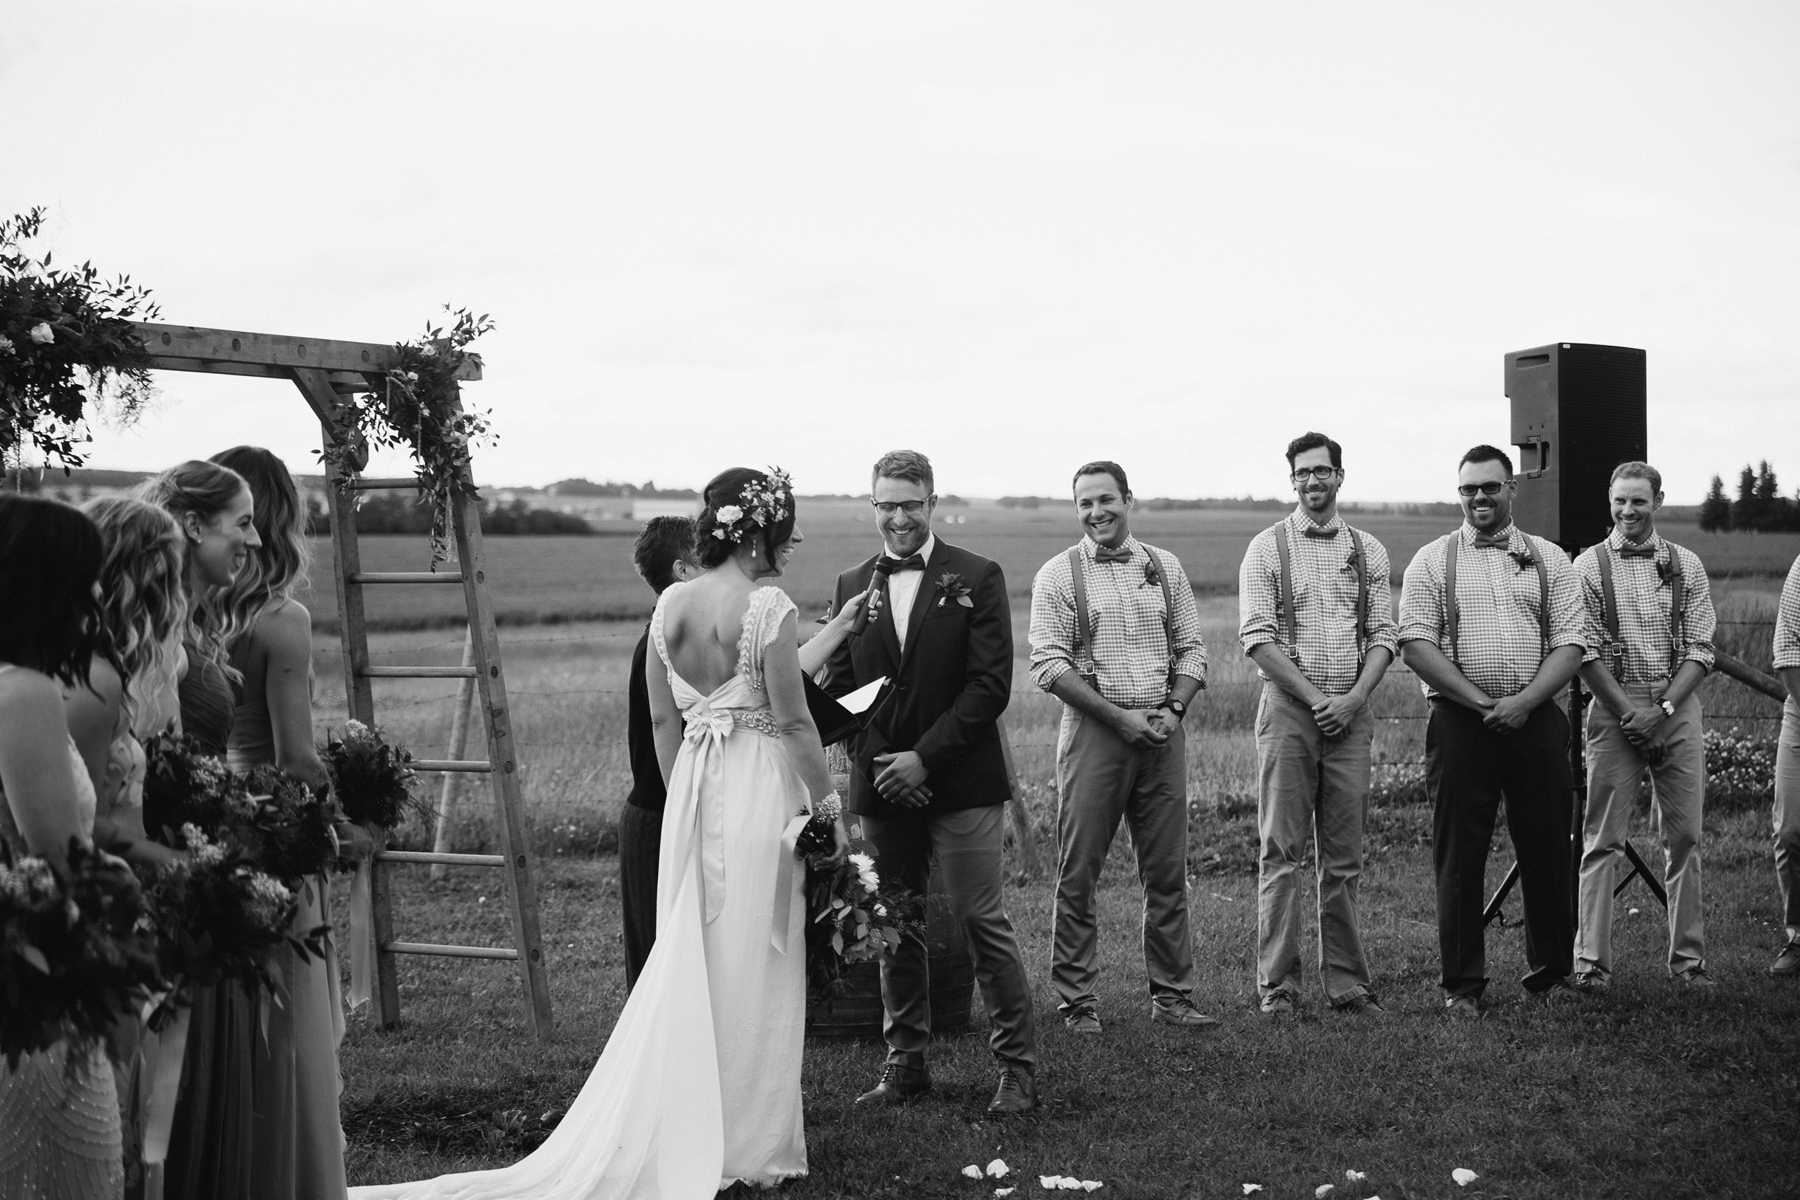 alberta-farm-wedding-photographer-rp-wj-101.jpg